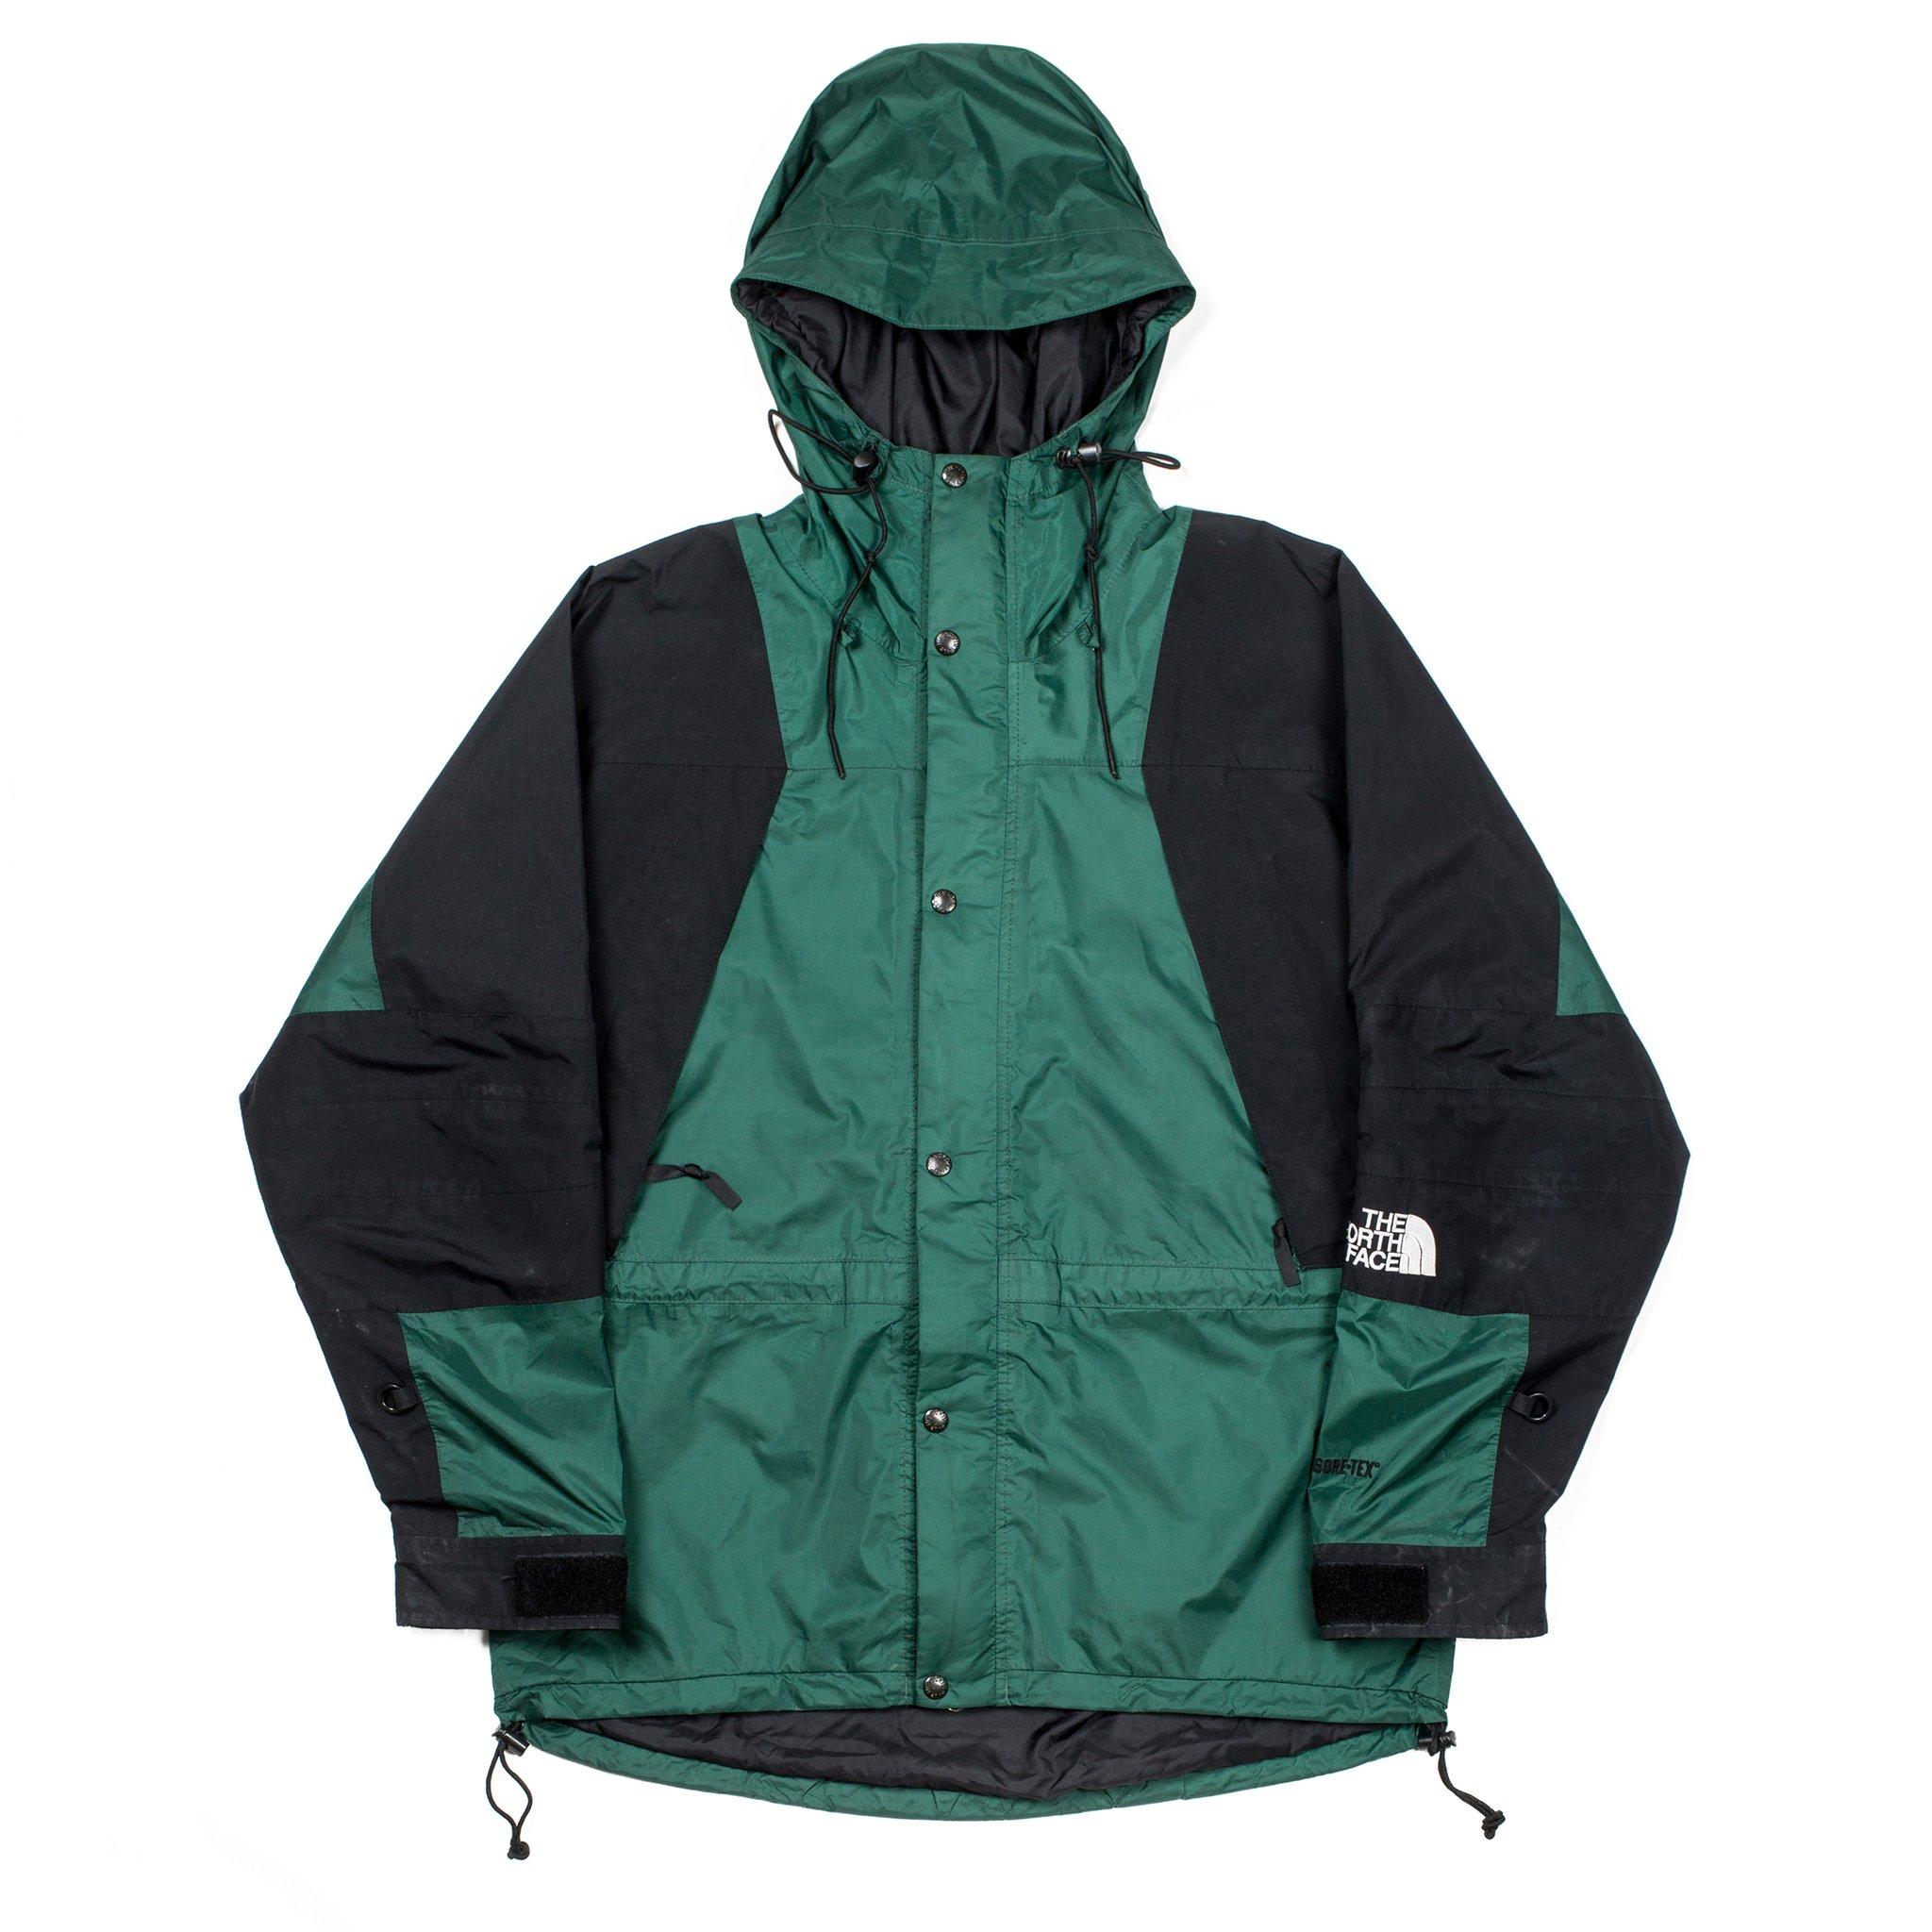 43f3e816f Very Goods | Vintage Medium North Face Mountain Light Jacket ...